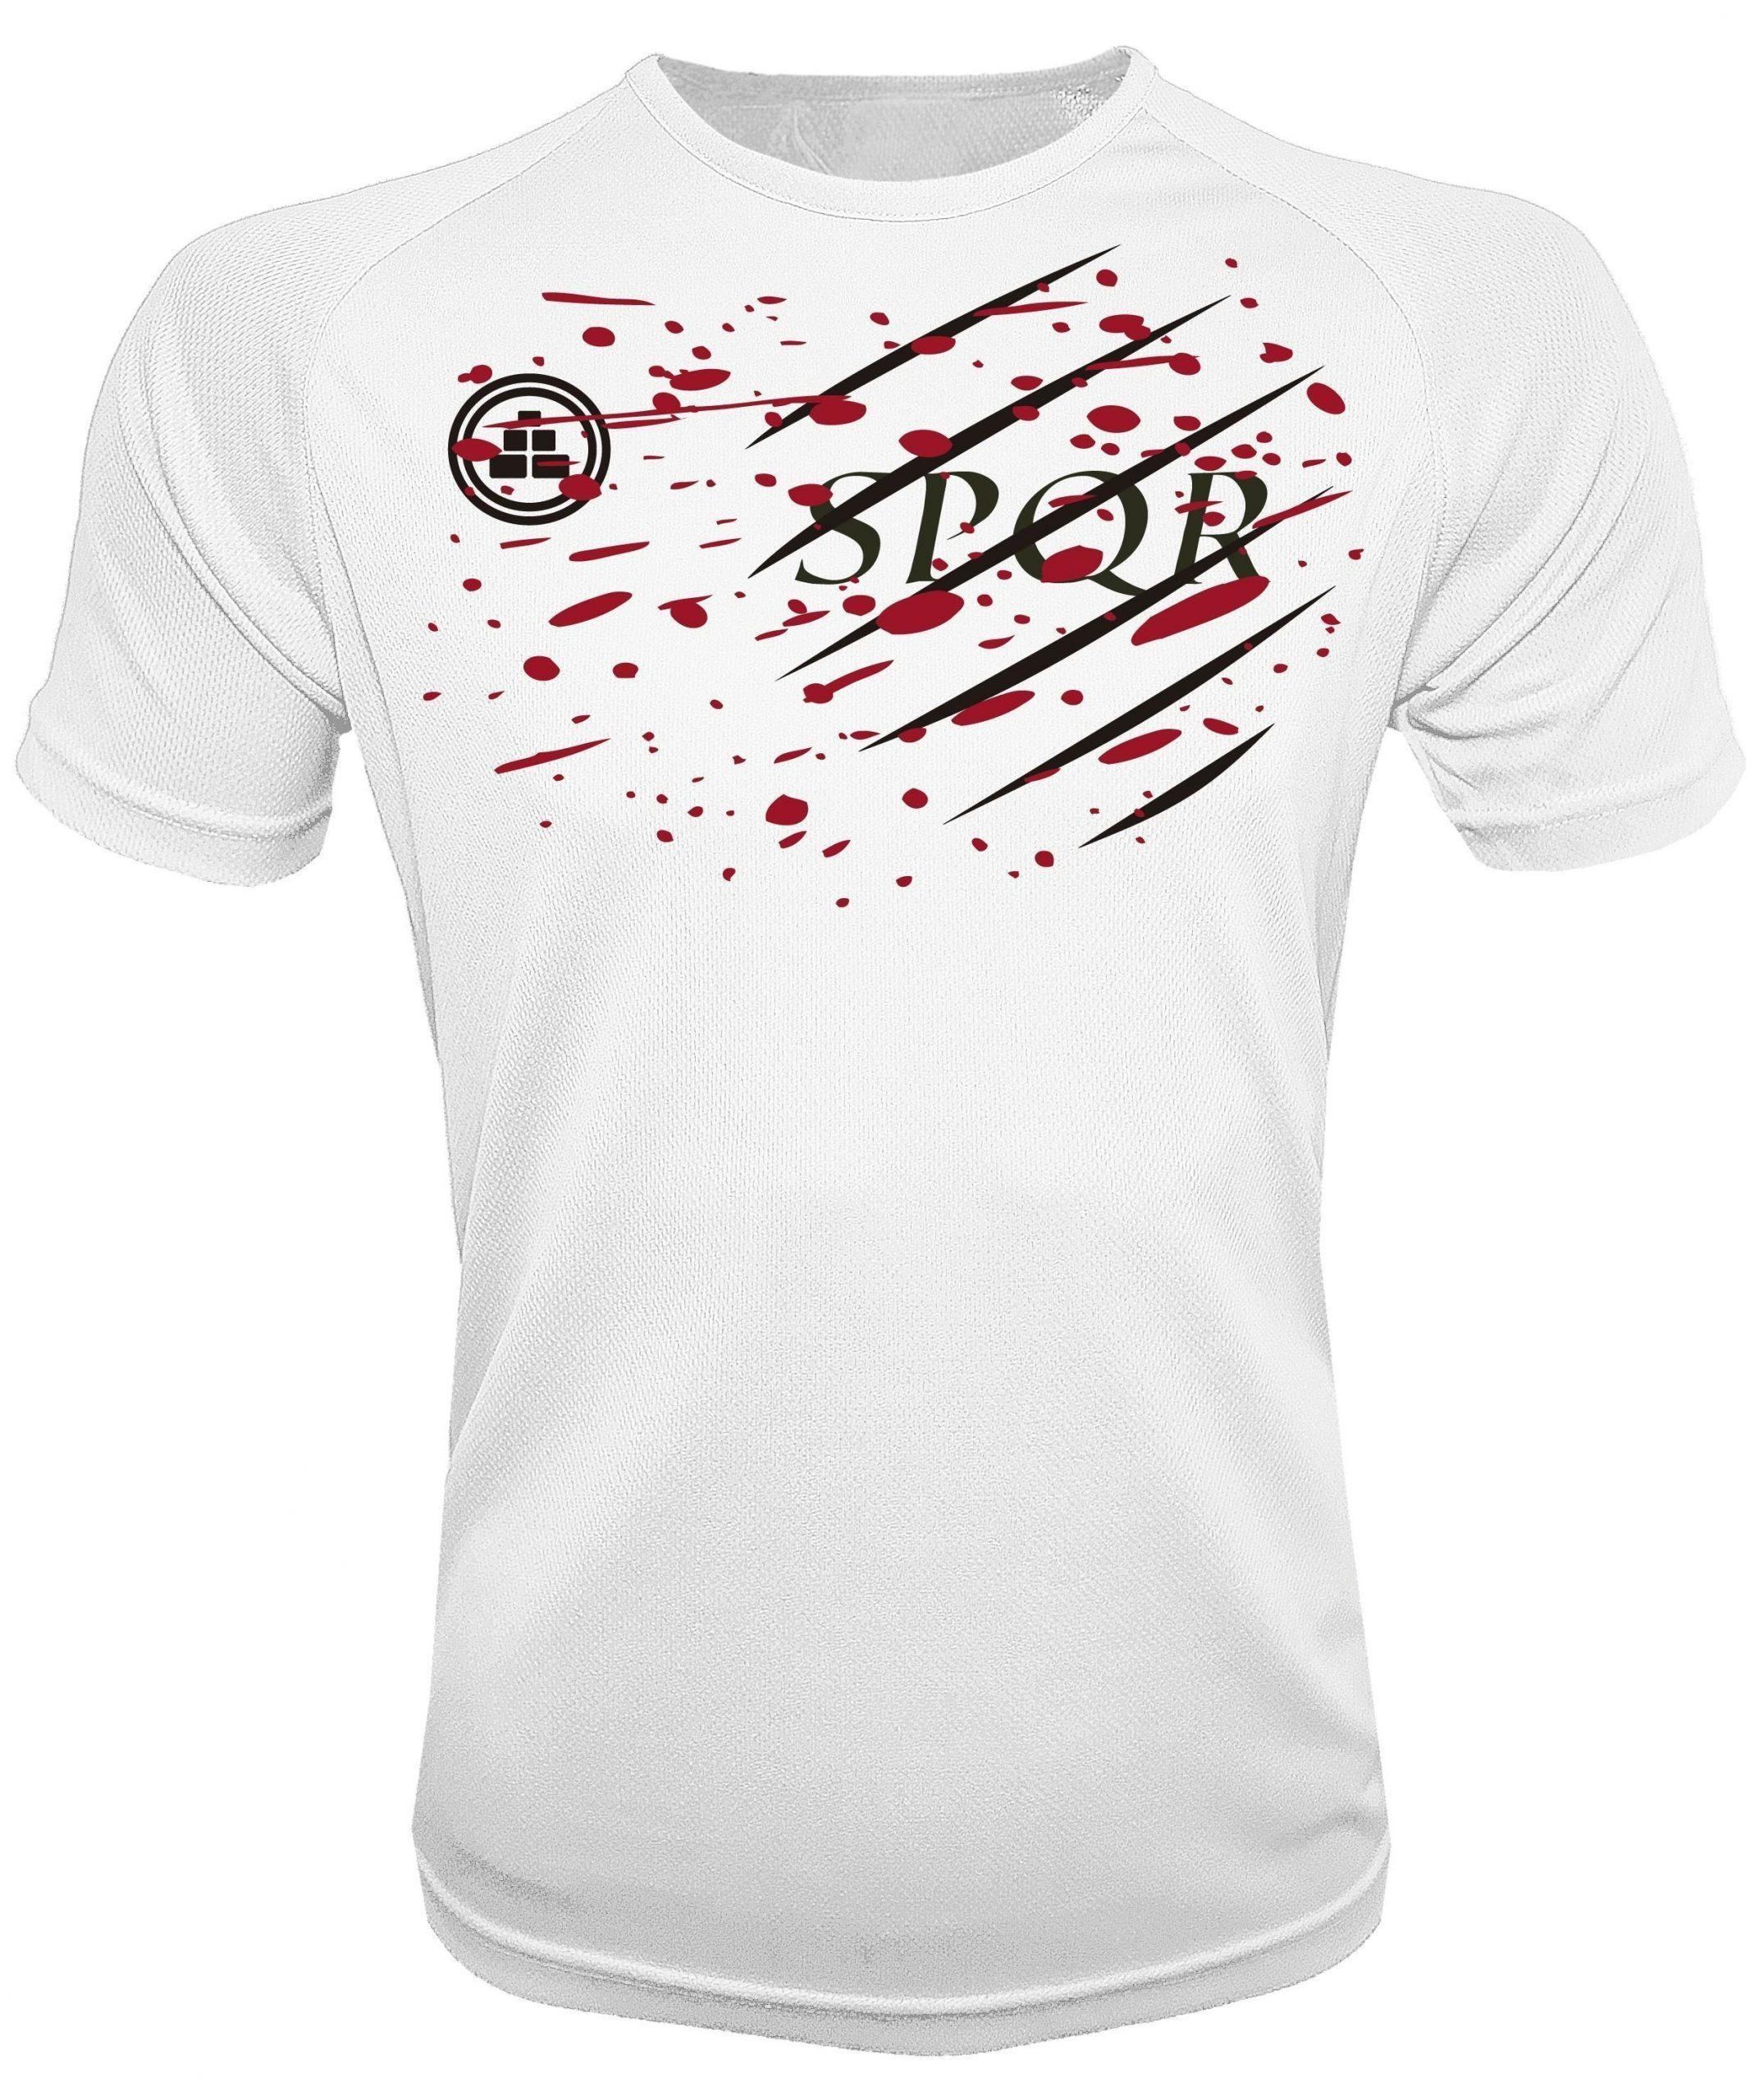 Camiseta deportiva Gladiador B